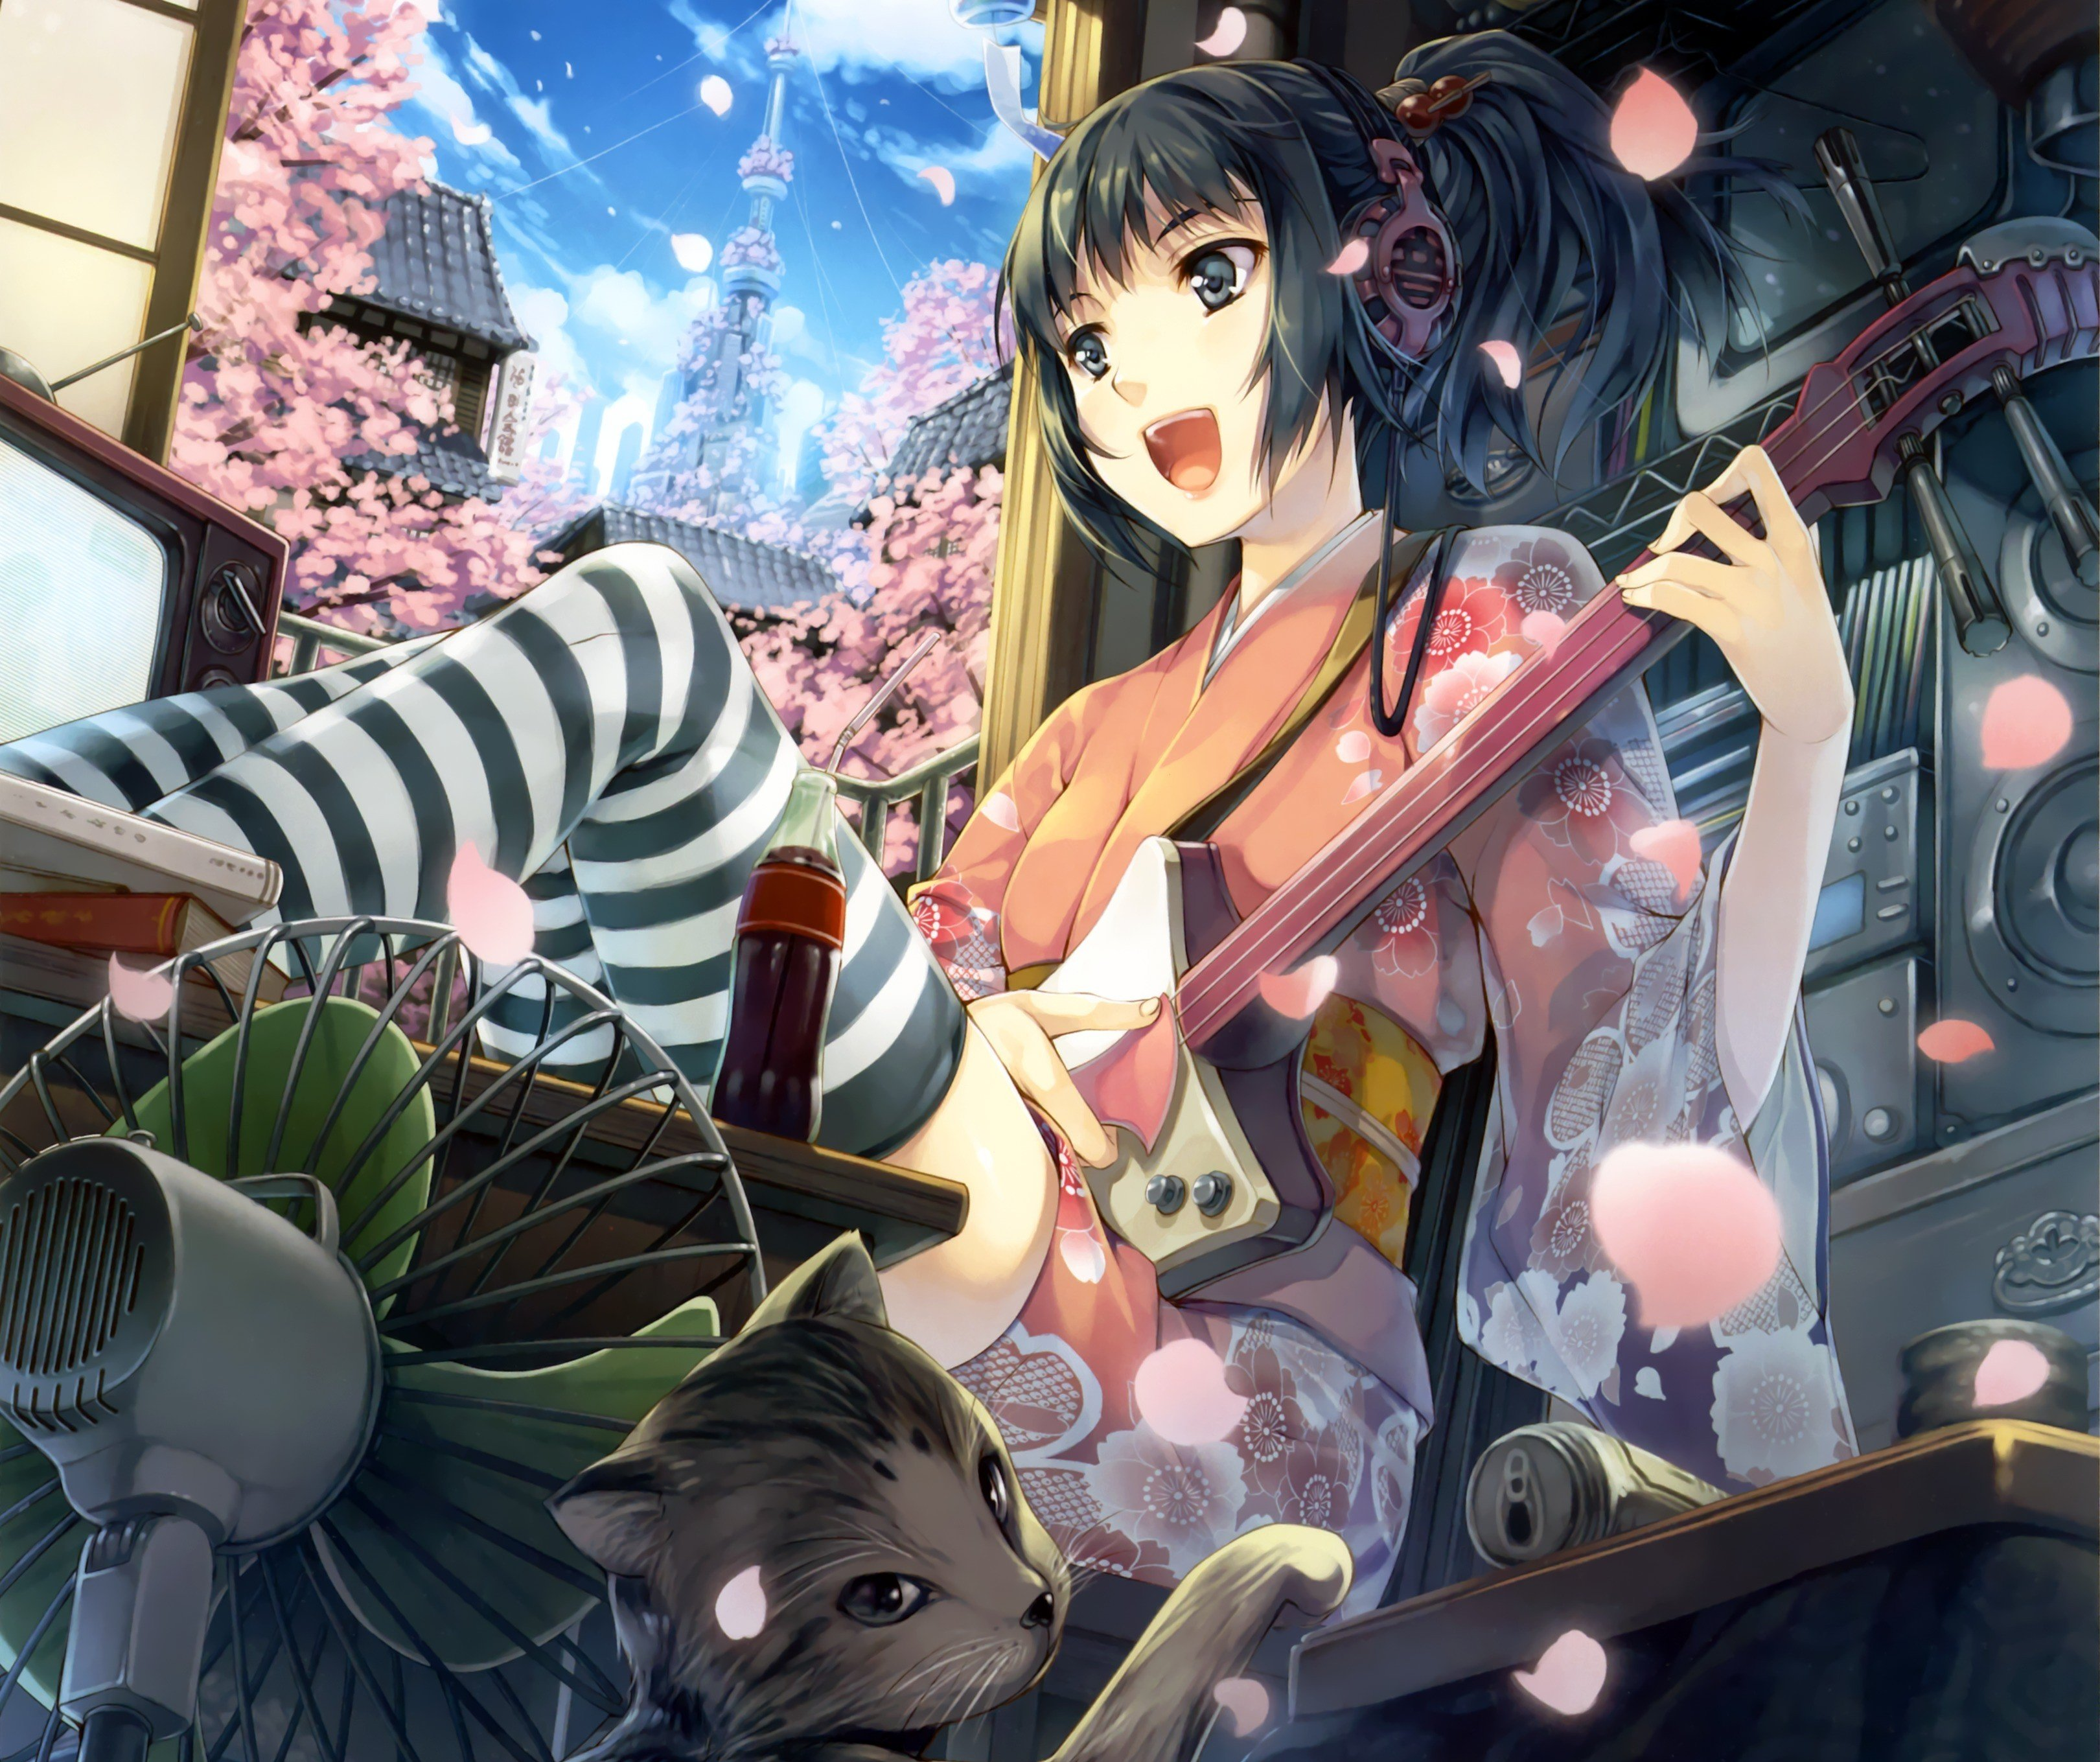 Anime Girls Black Hair Headphones Guitar Thigh Highs